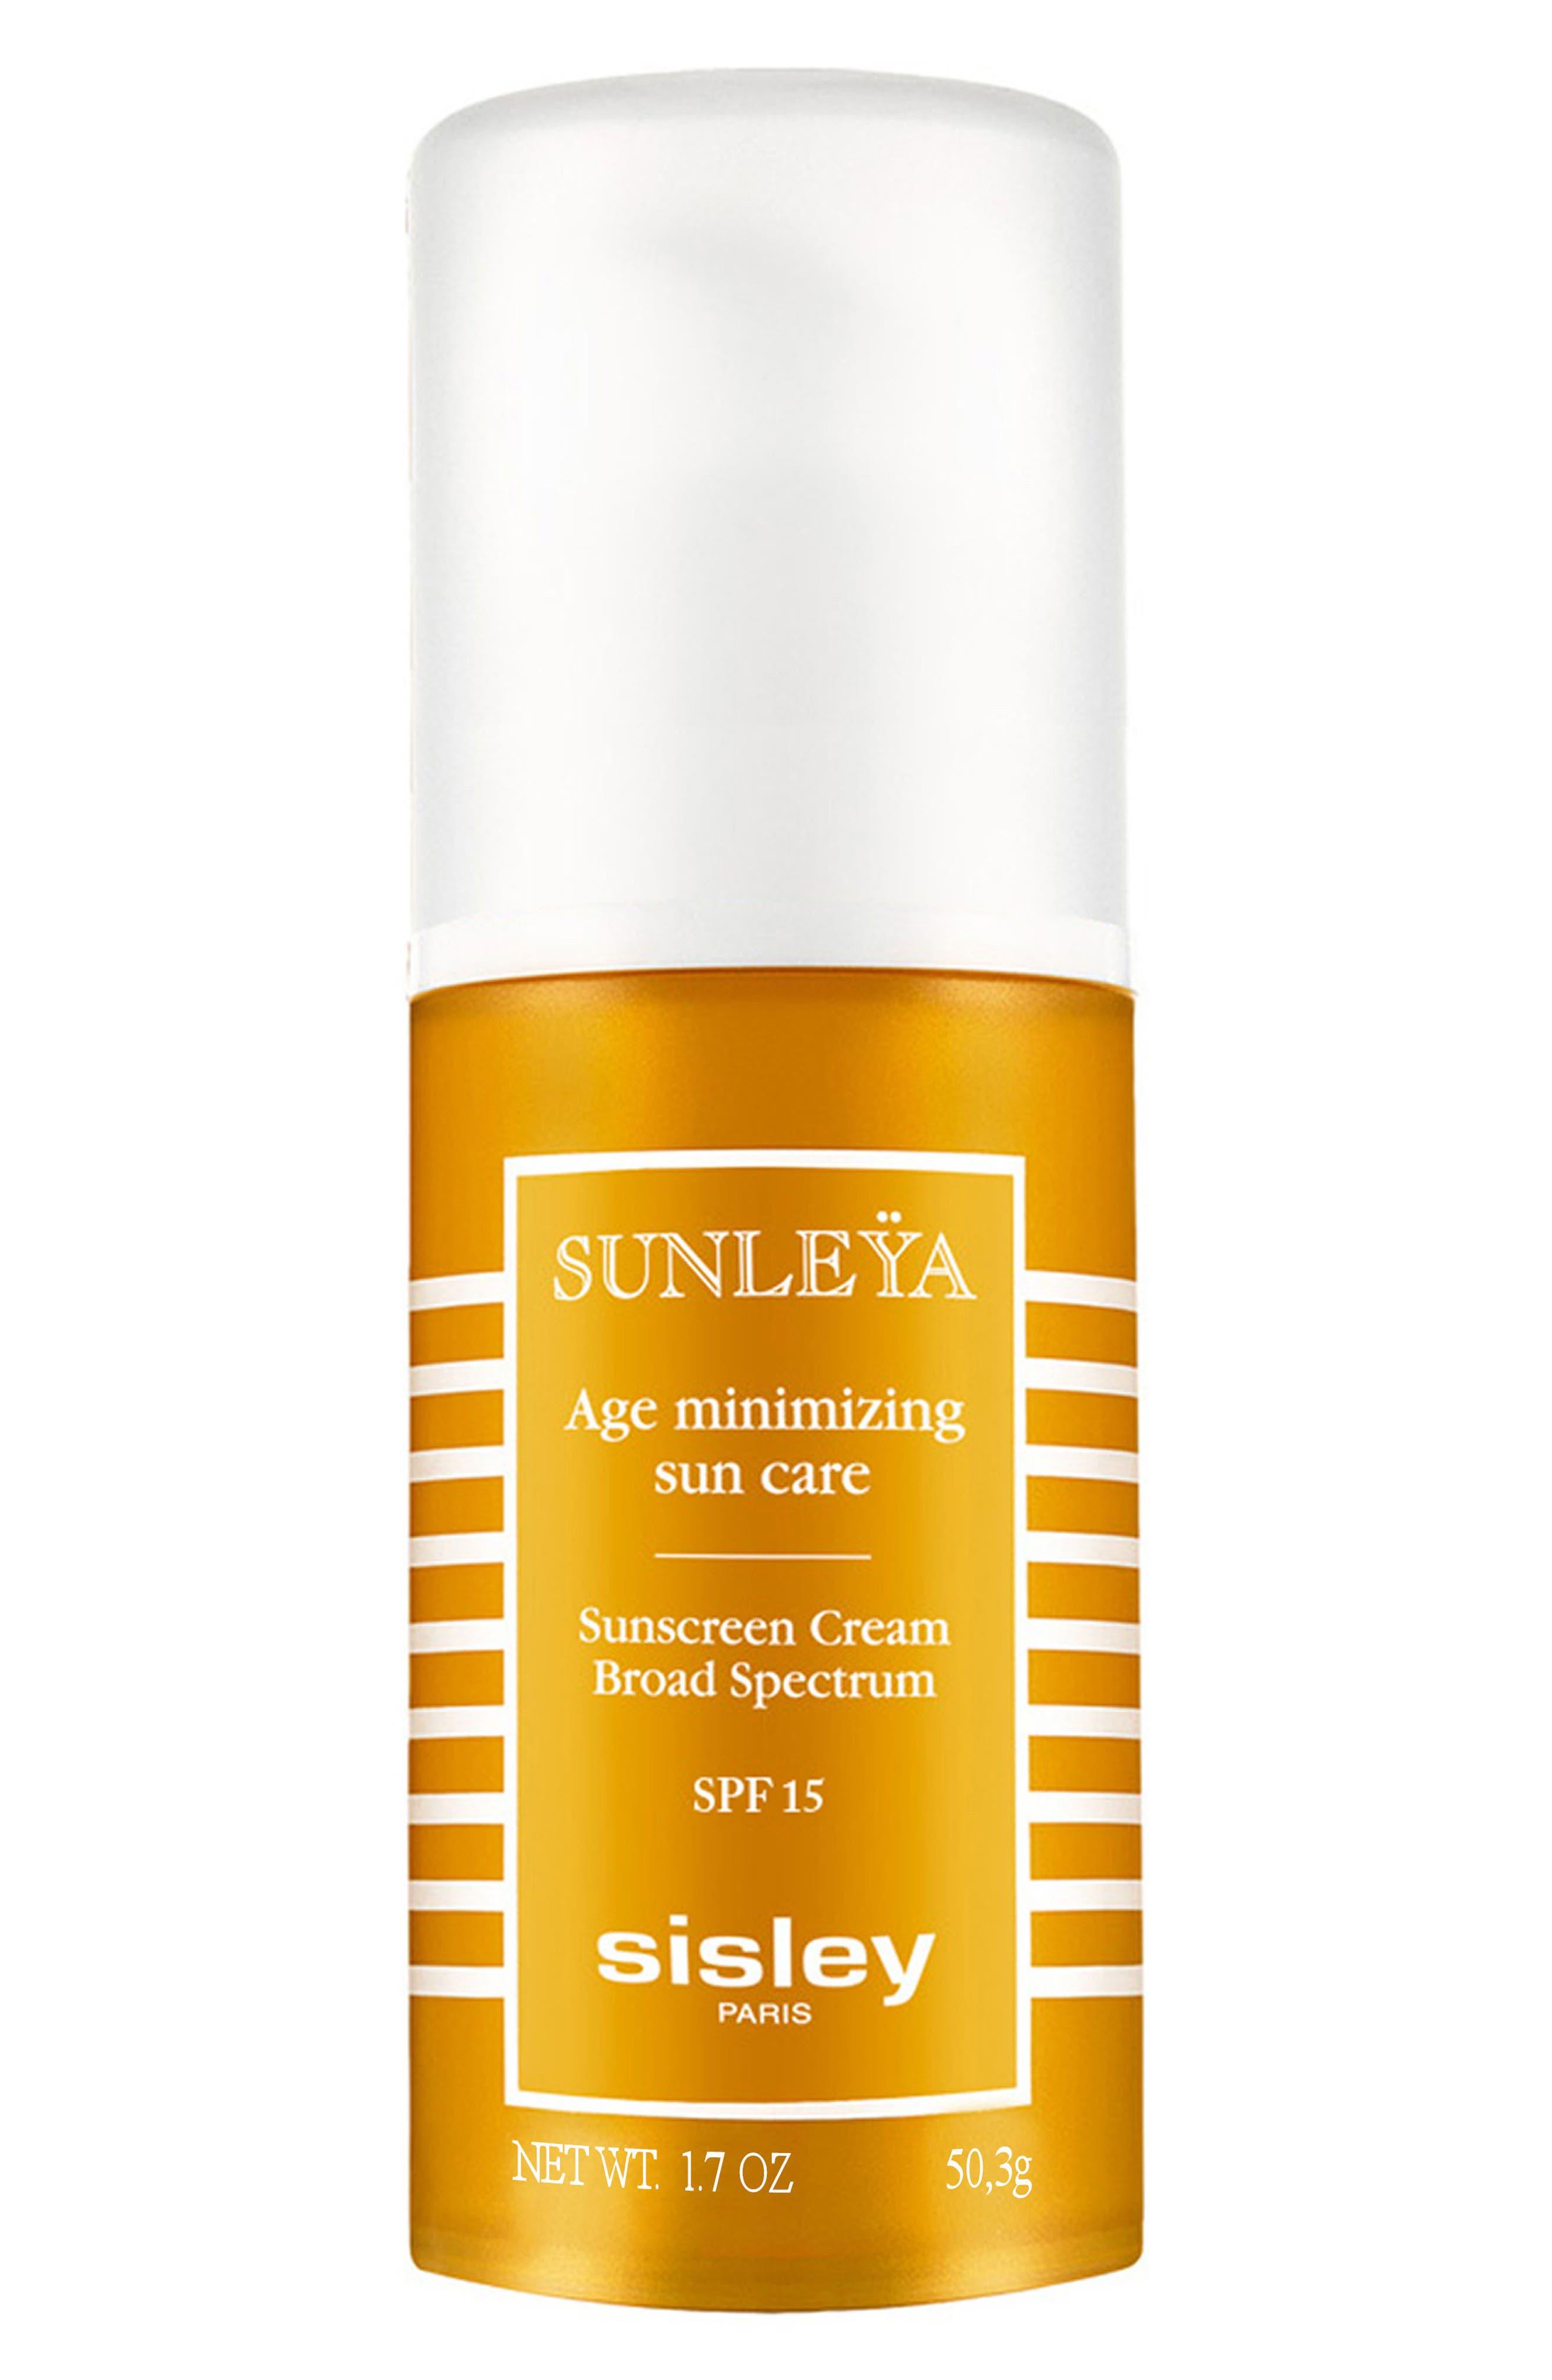 Sisley Paris 'Sunleÿa' Age Minimizing Sun Care SPF 15